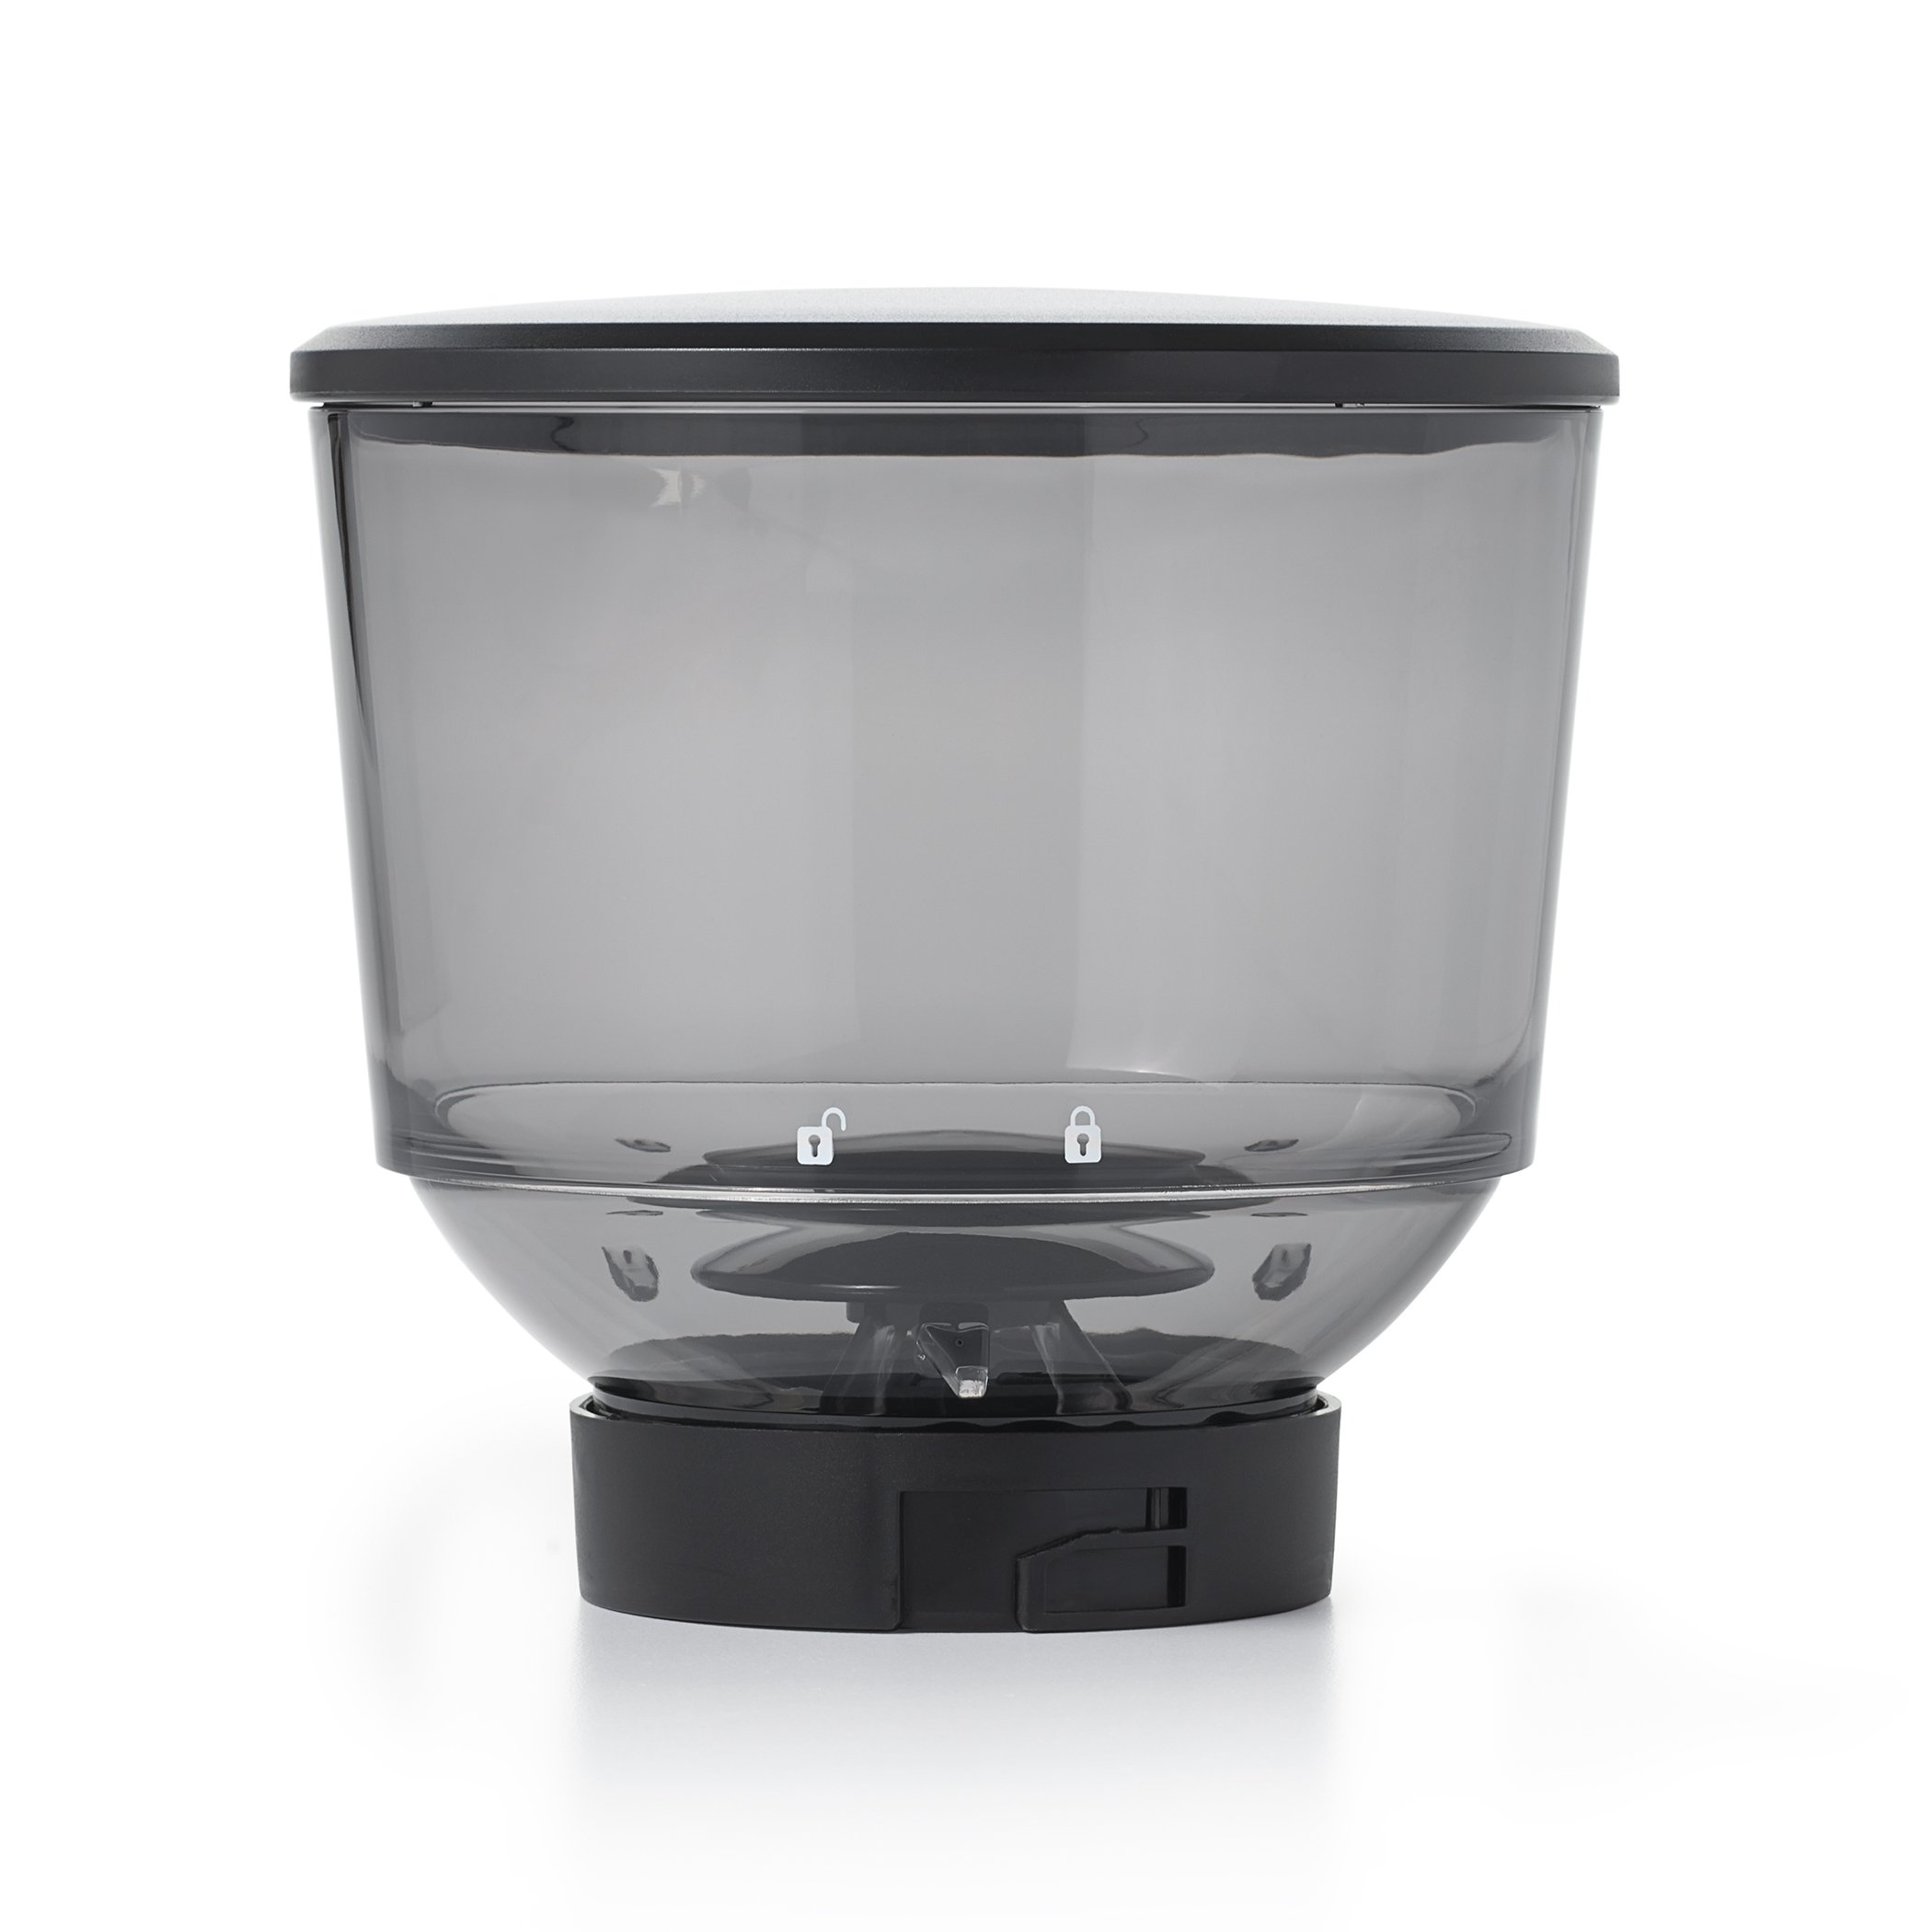 OXO 8716200 On Conical Burr Grinder Hopper with Lid, Black